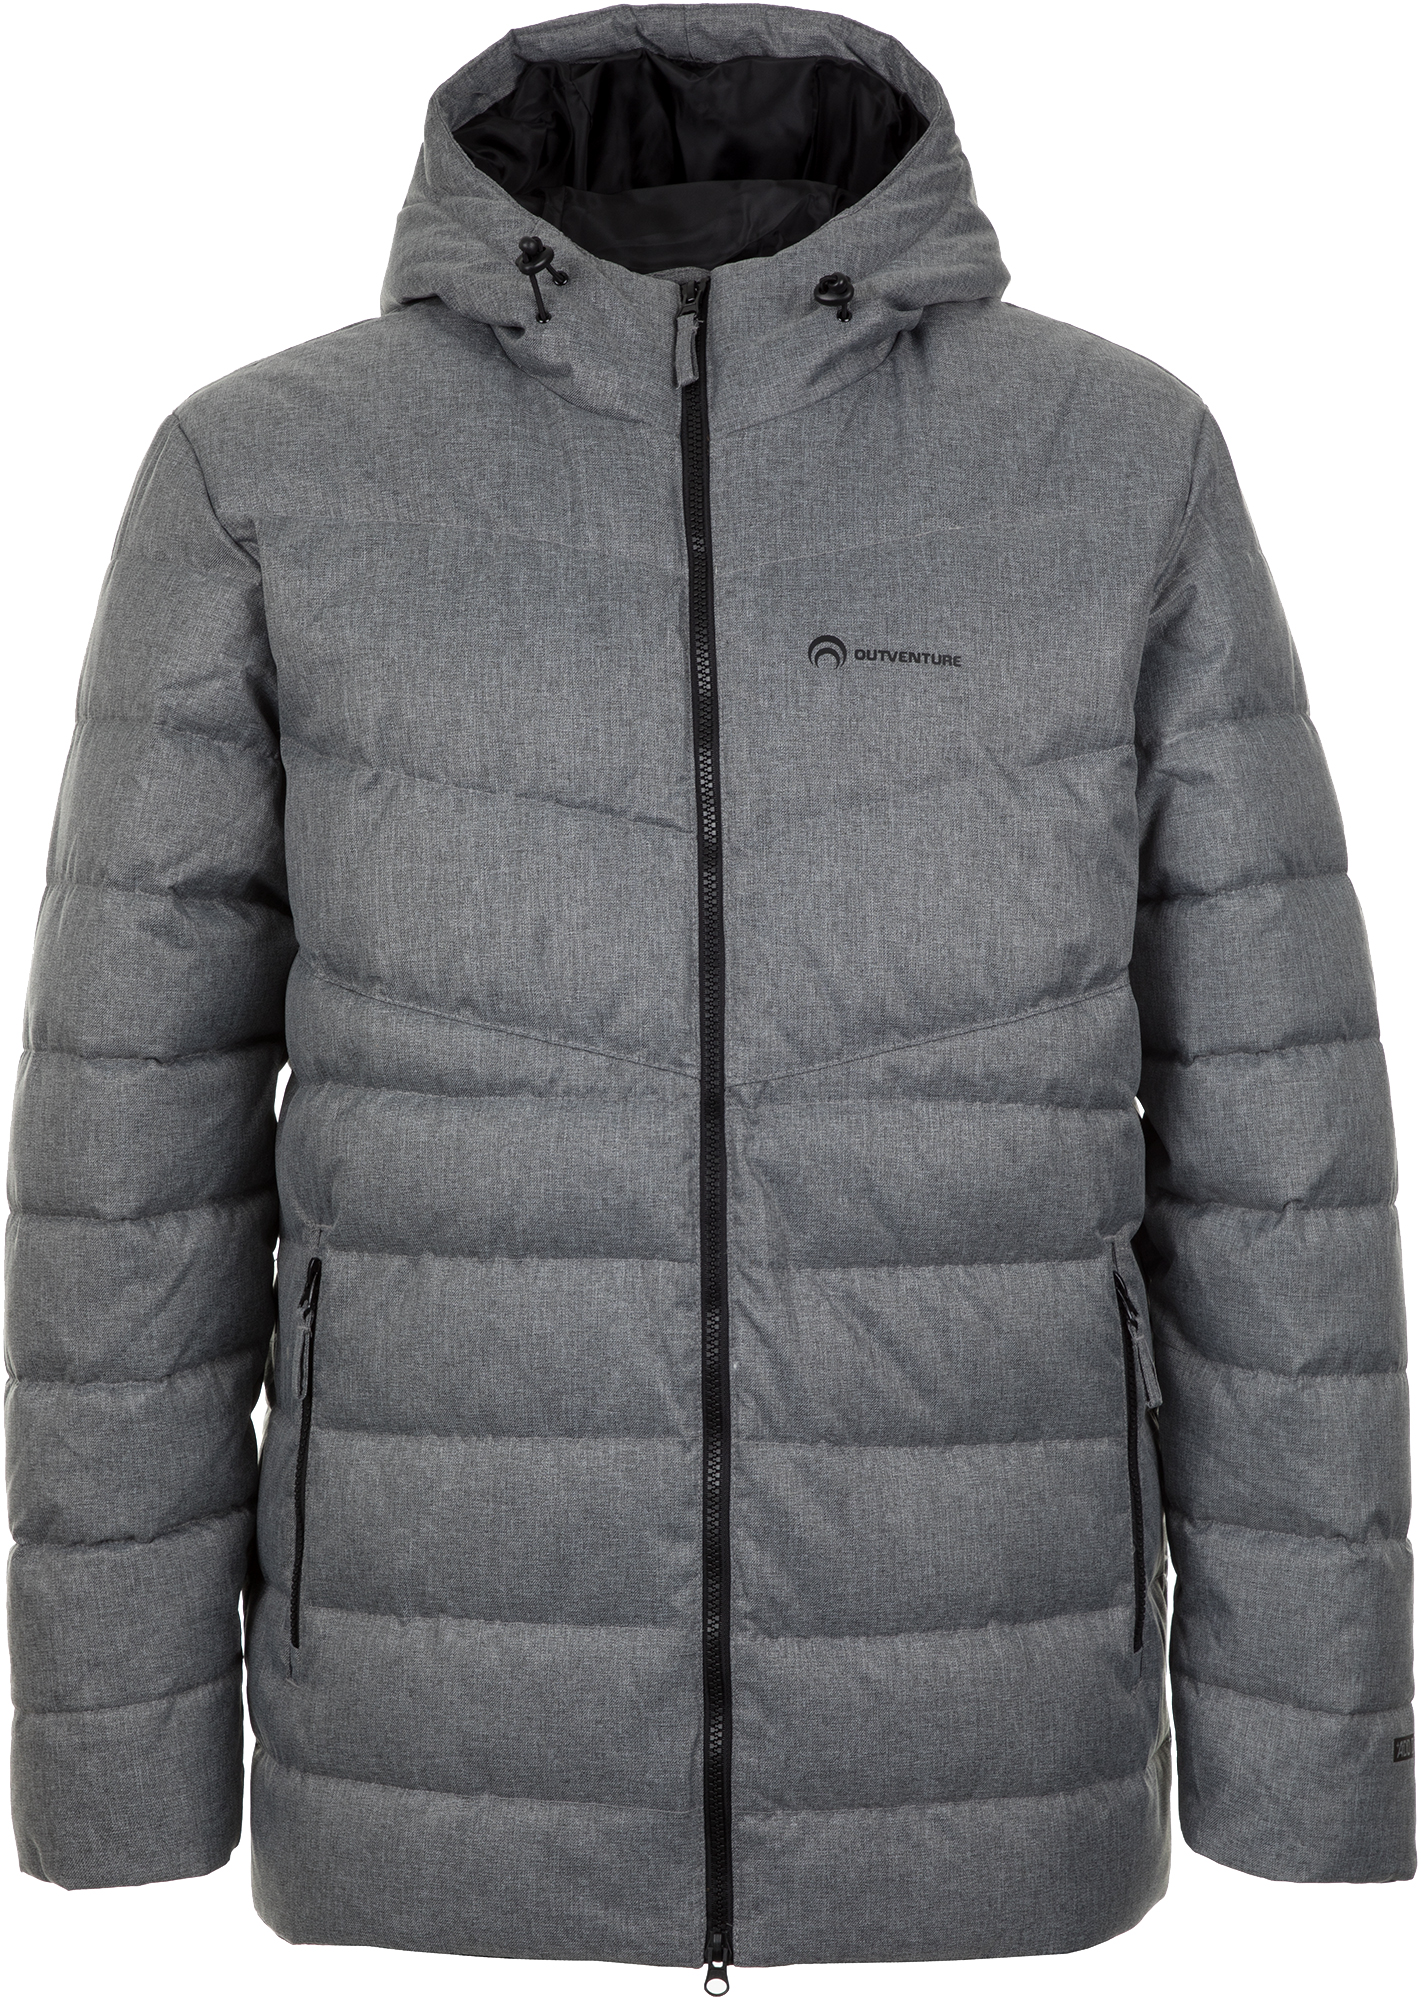 Outventure Куртка пуховая мужская Outventure, размер 62 цена и фото